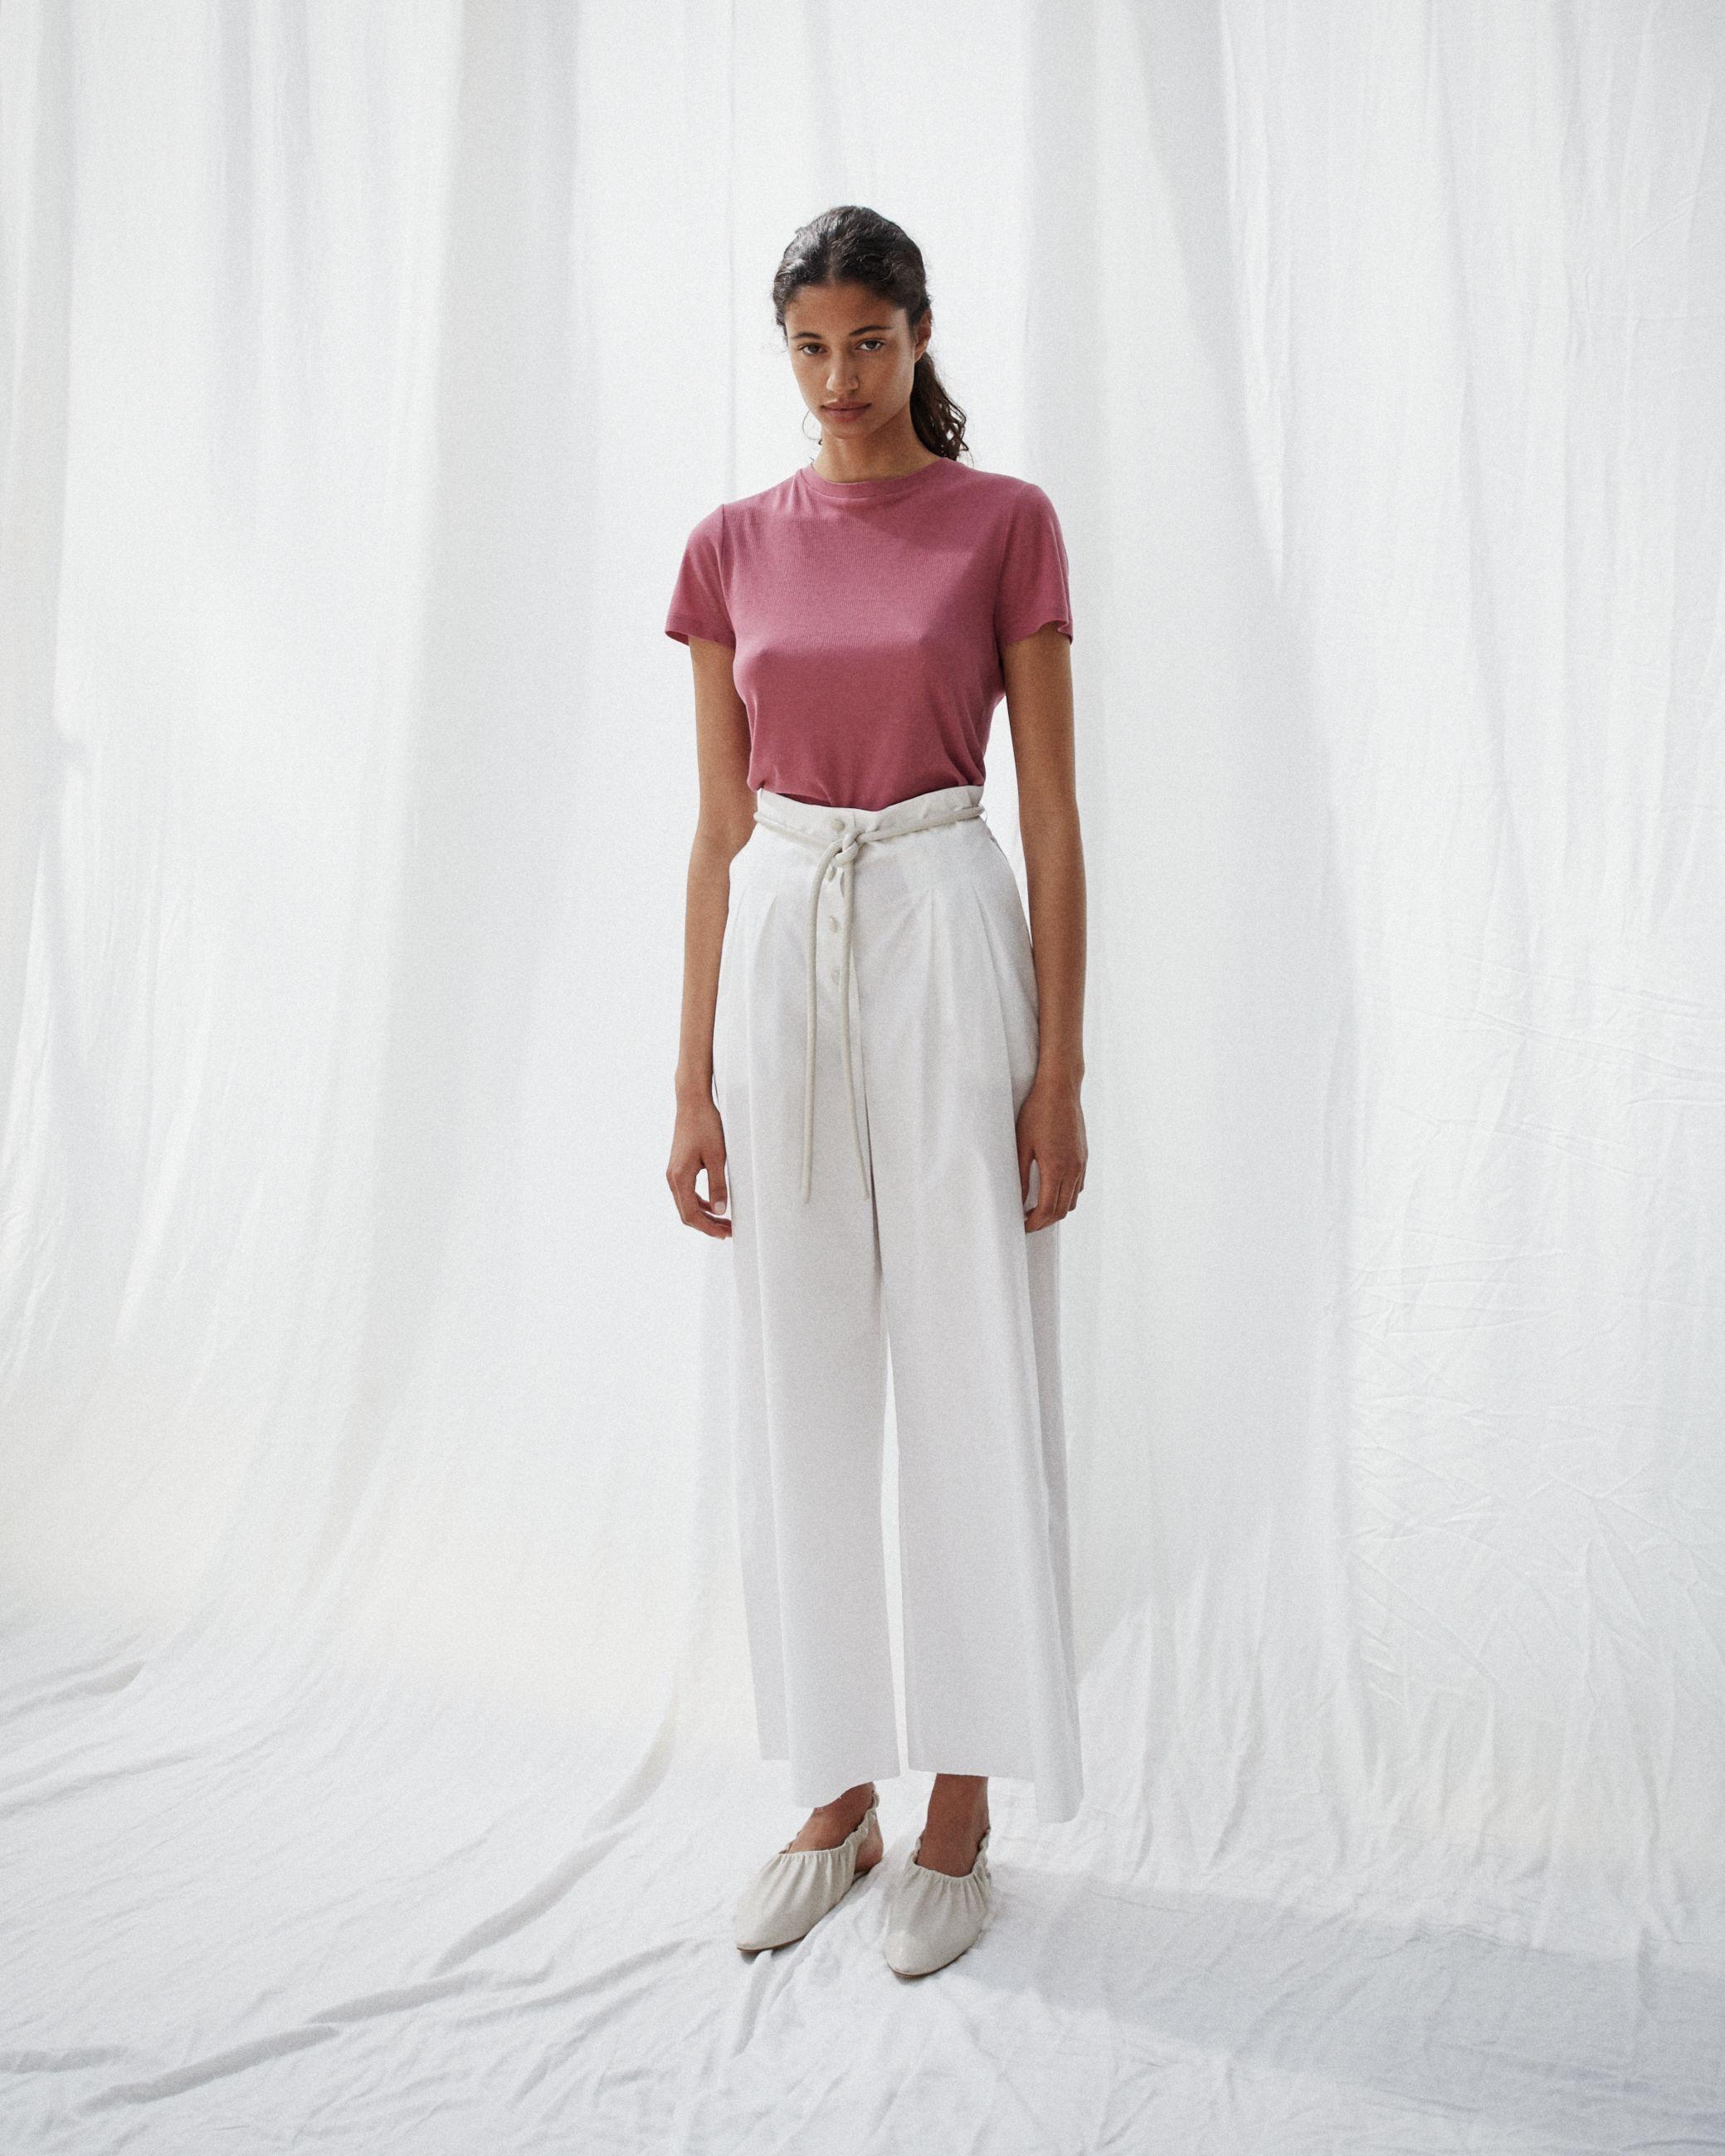 DUNN Palazzo pants - White creme €420 | Short sleeve mini dress, Nanushka,  High wasted pants